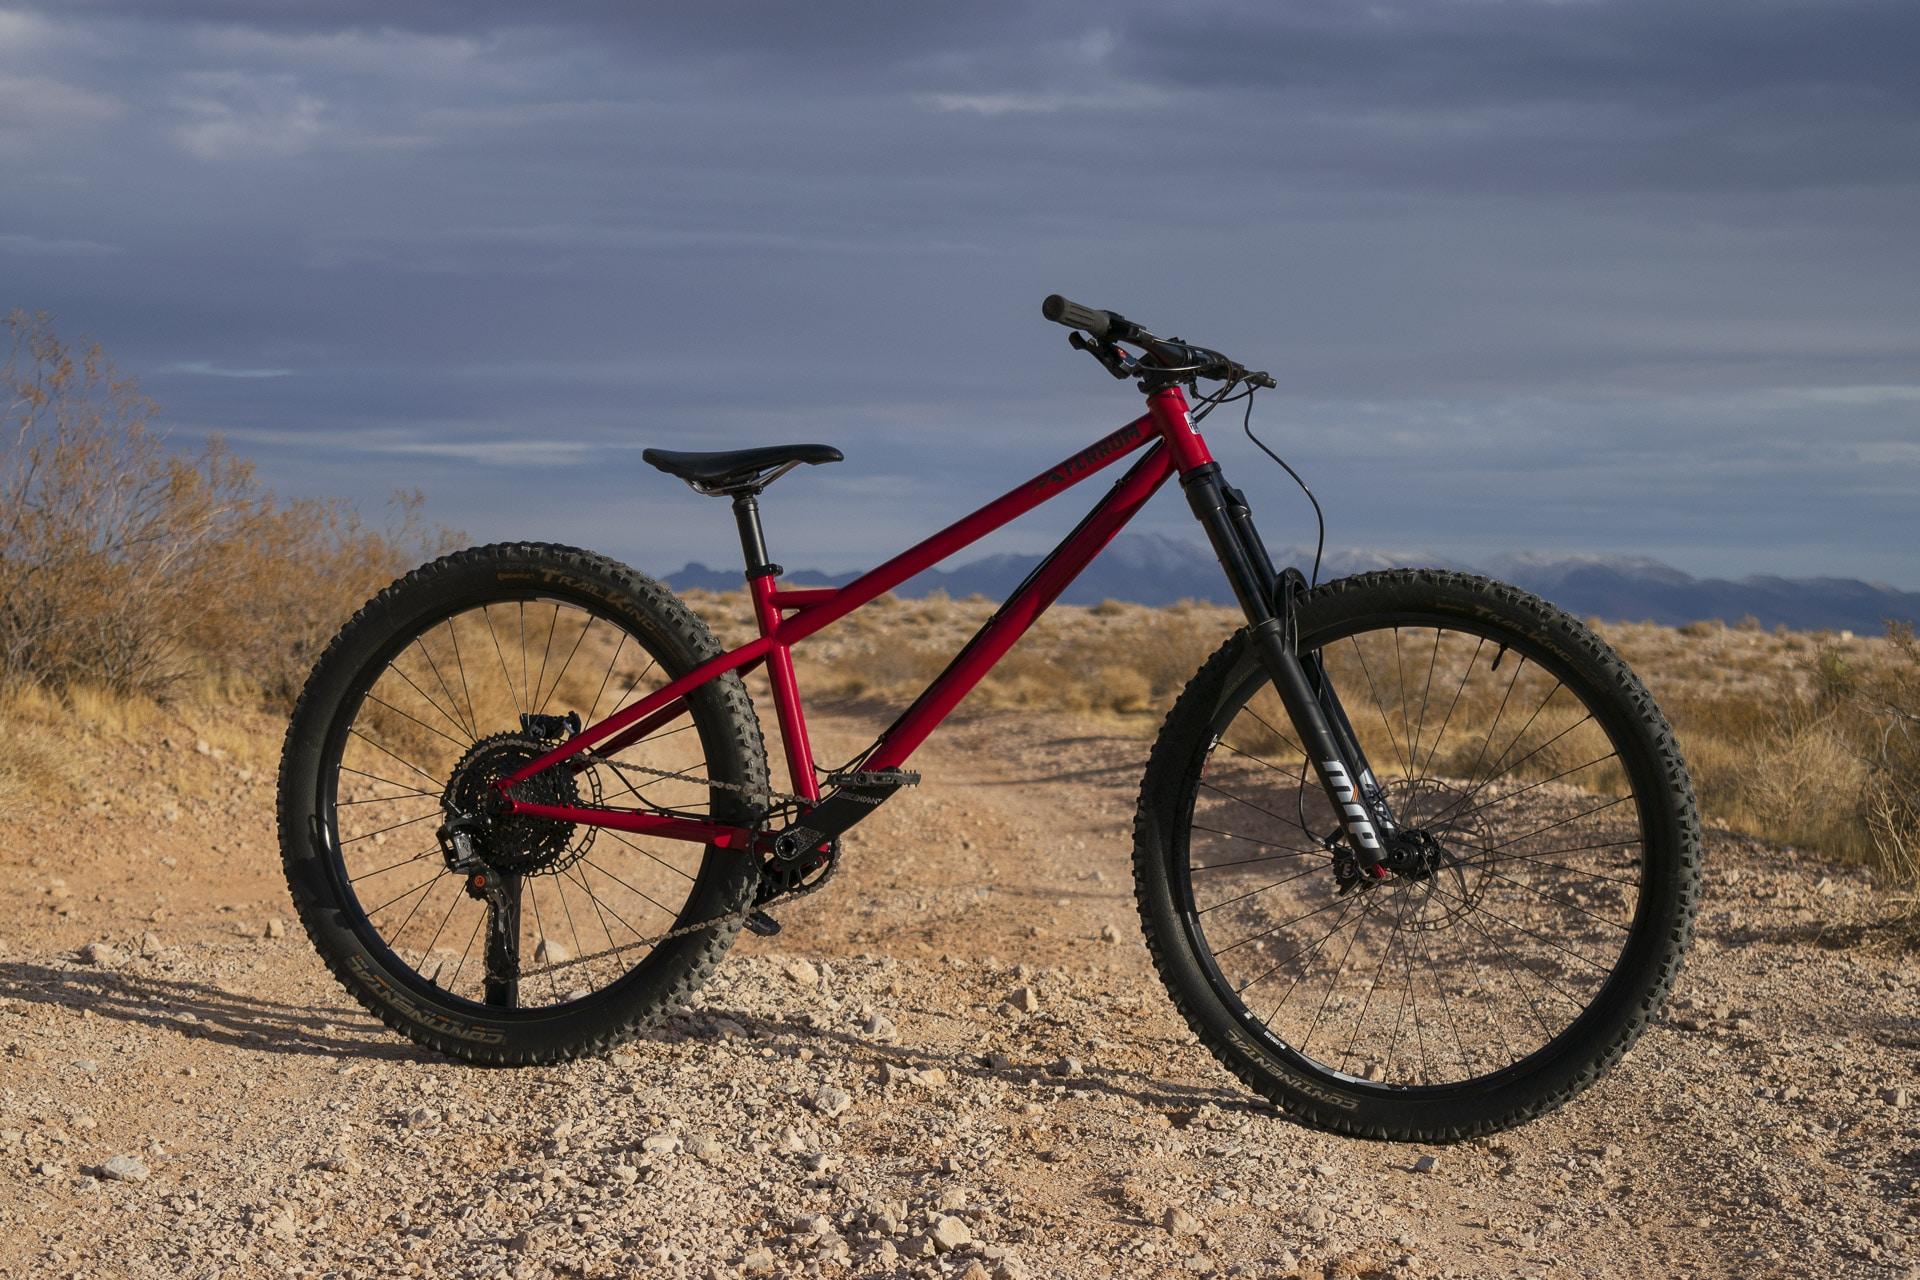 Steel Frame Hardtail Mountain Bike